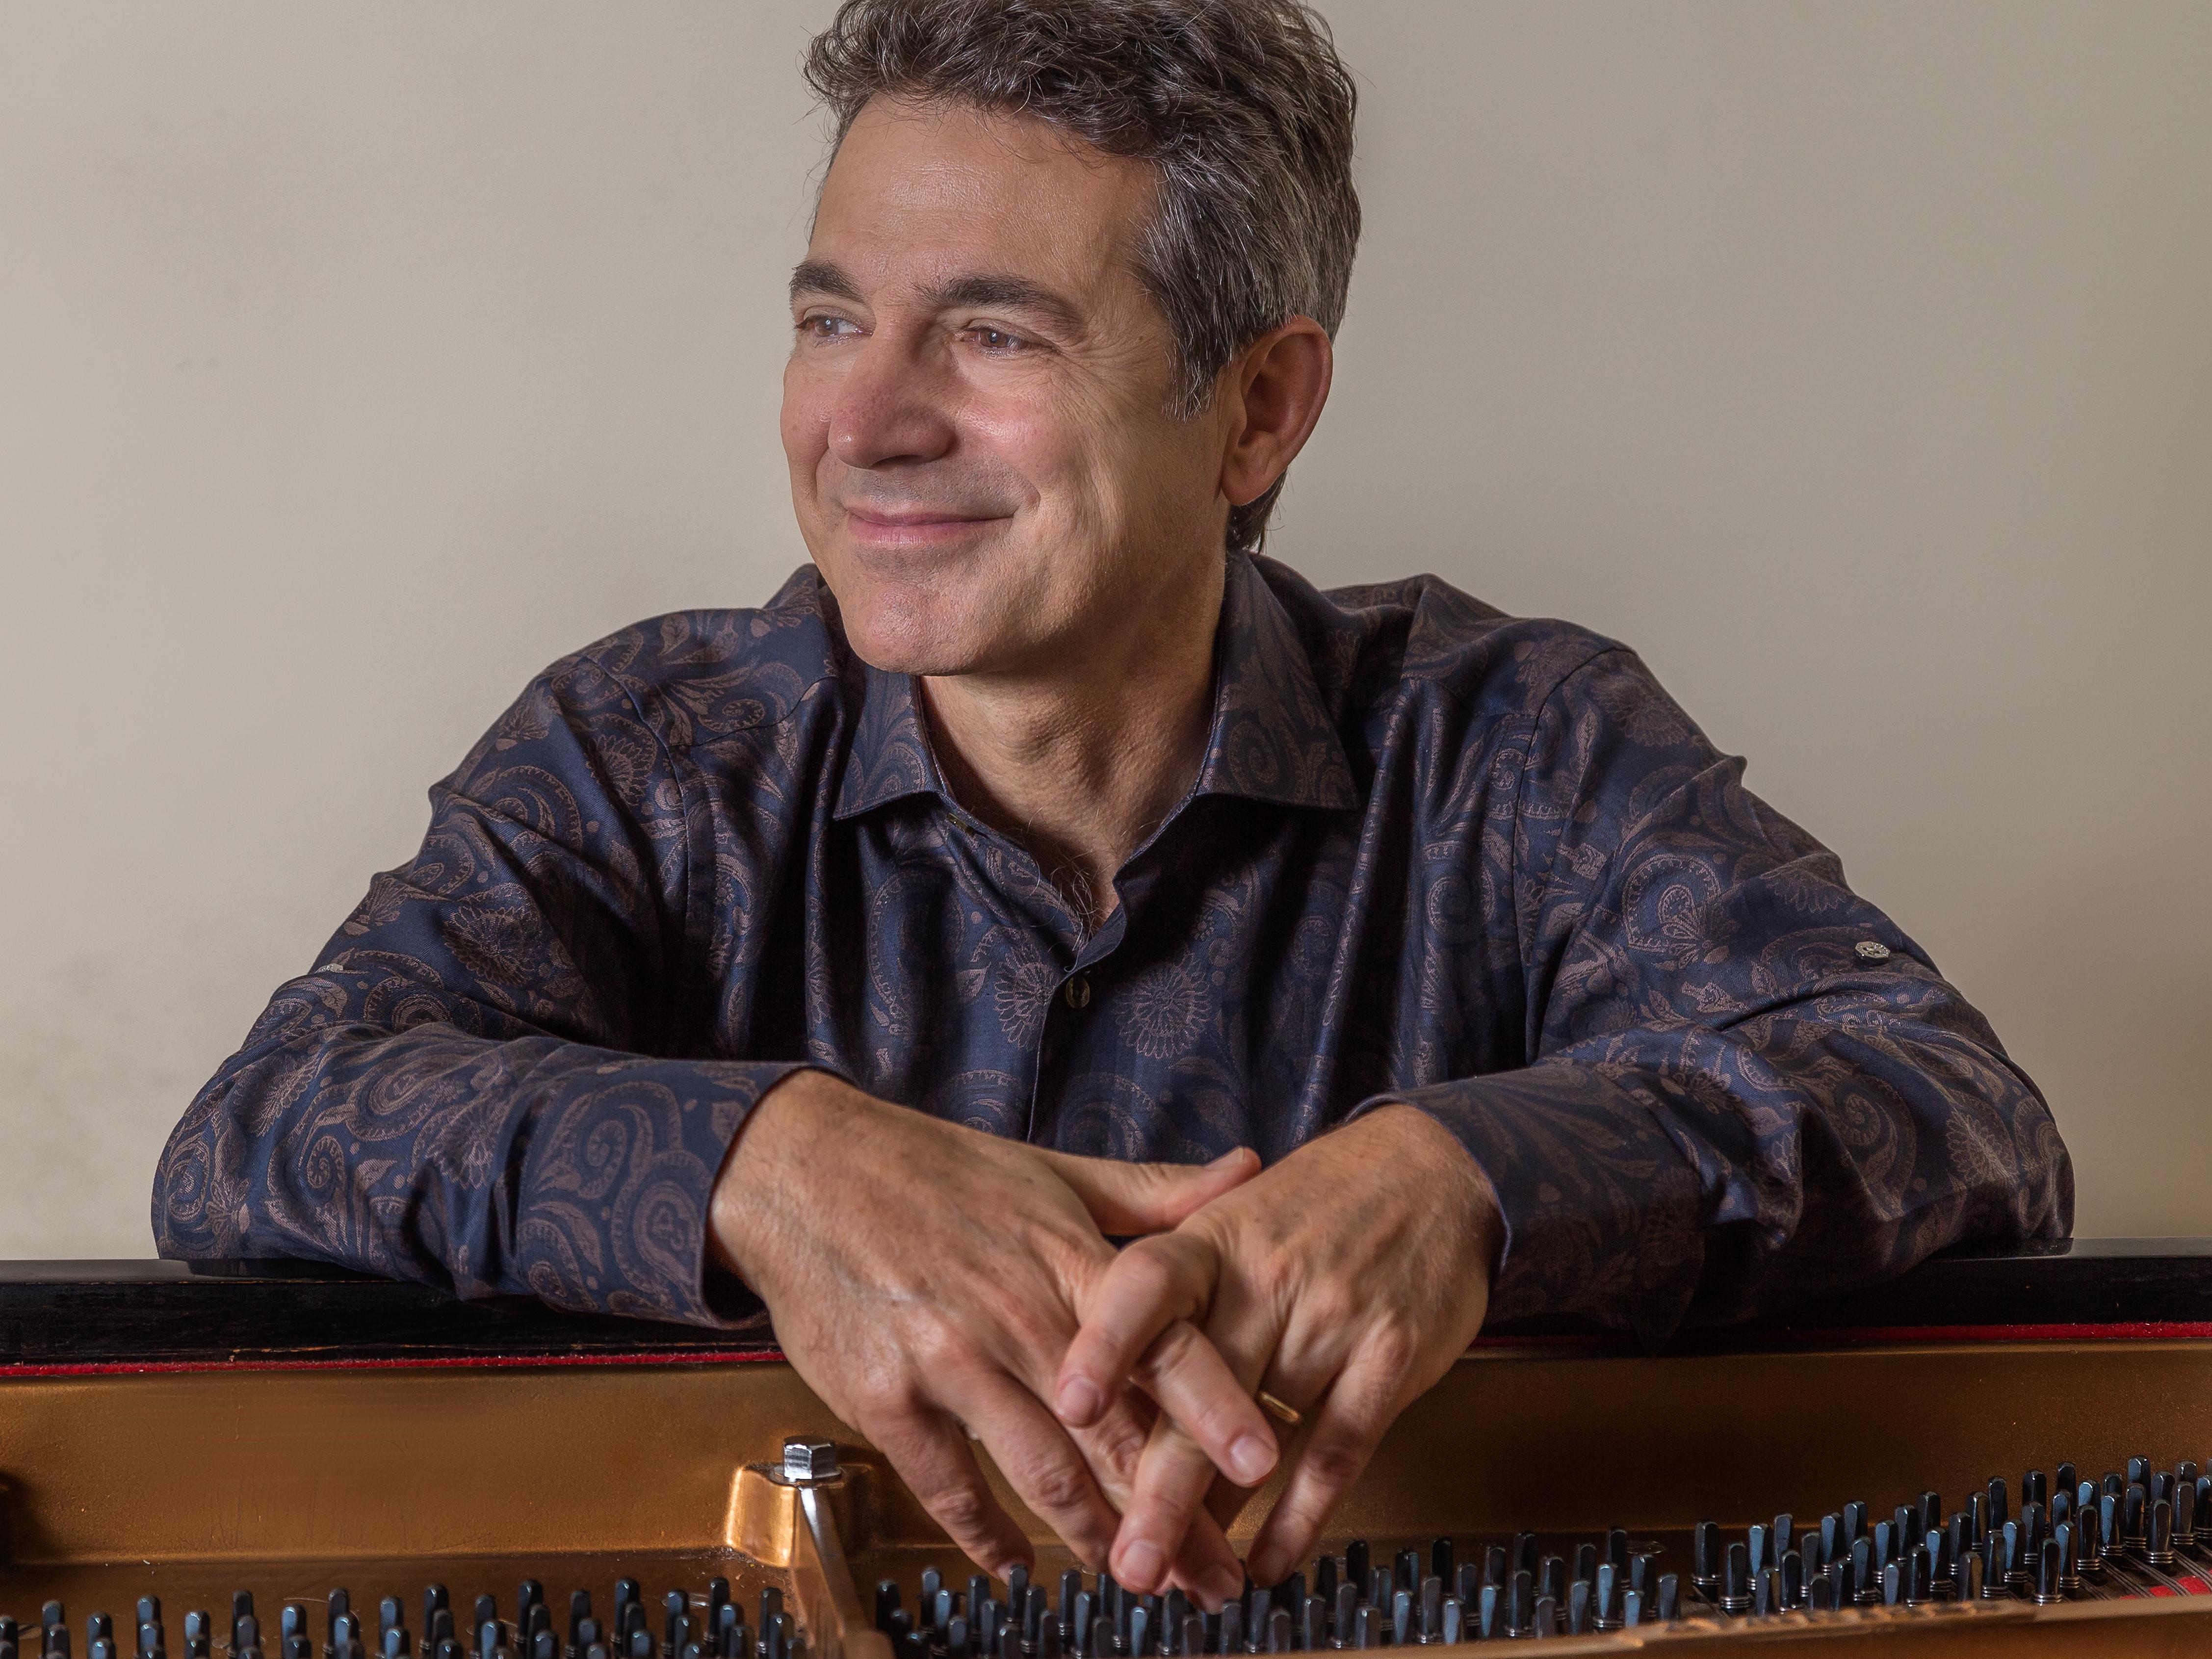 Aleck Karis, piano